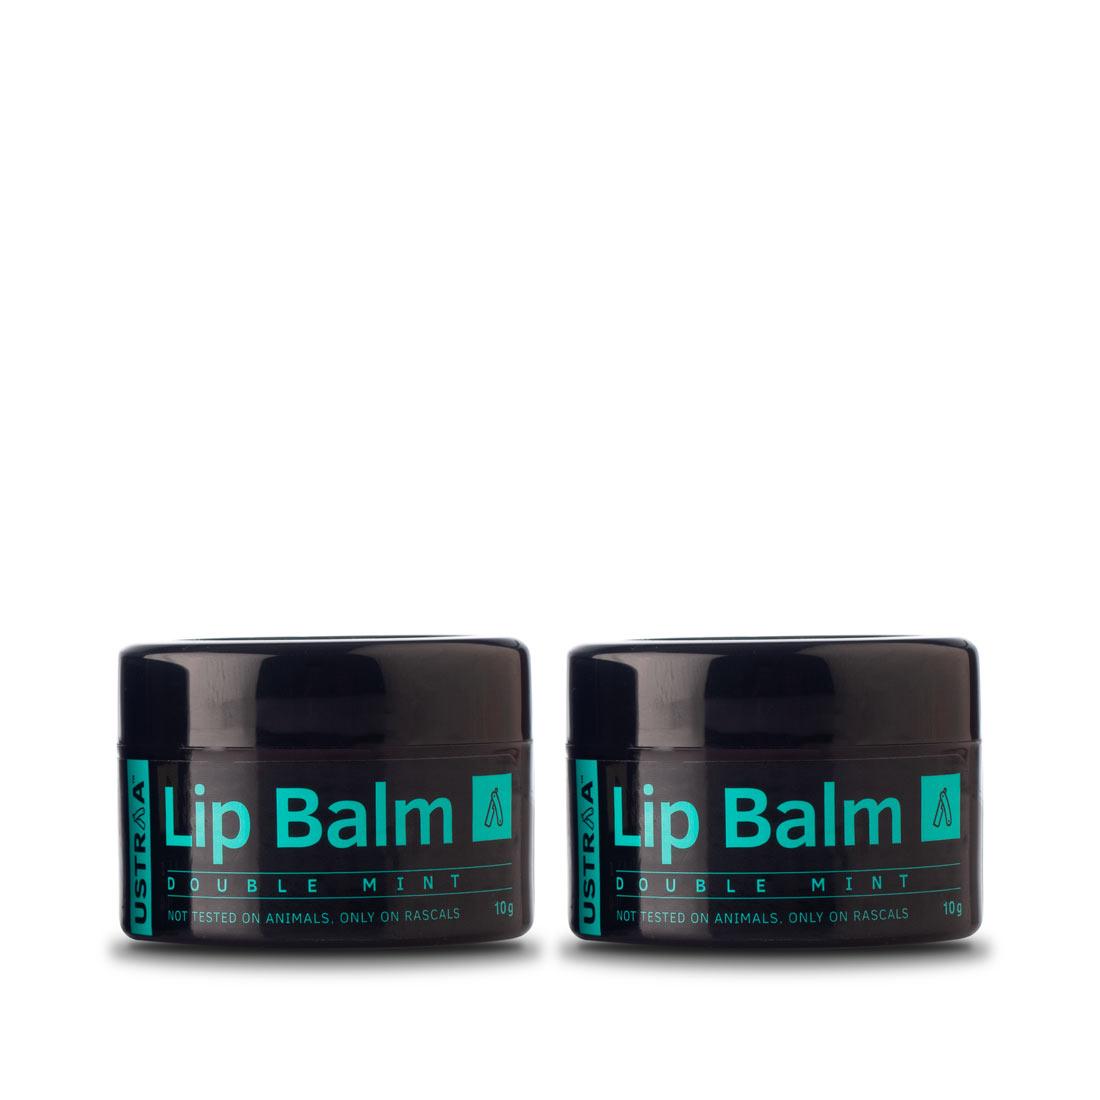 Ustraa Lip Balm (Double Mint) - Set of 2 (10gm)